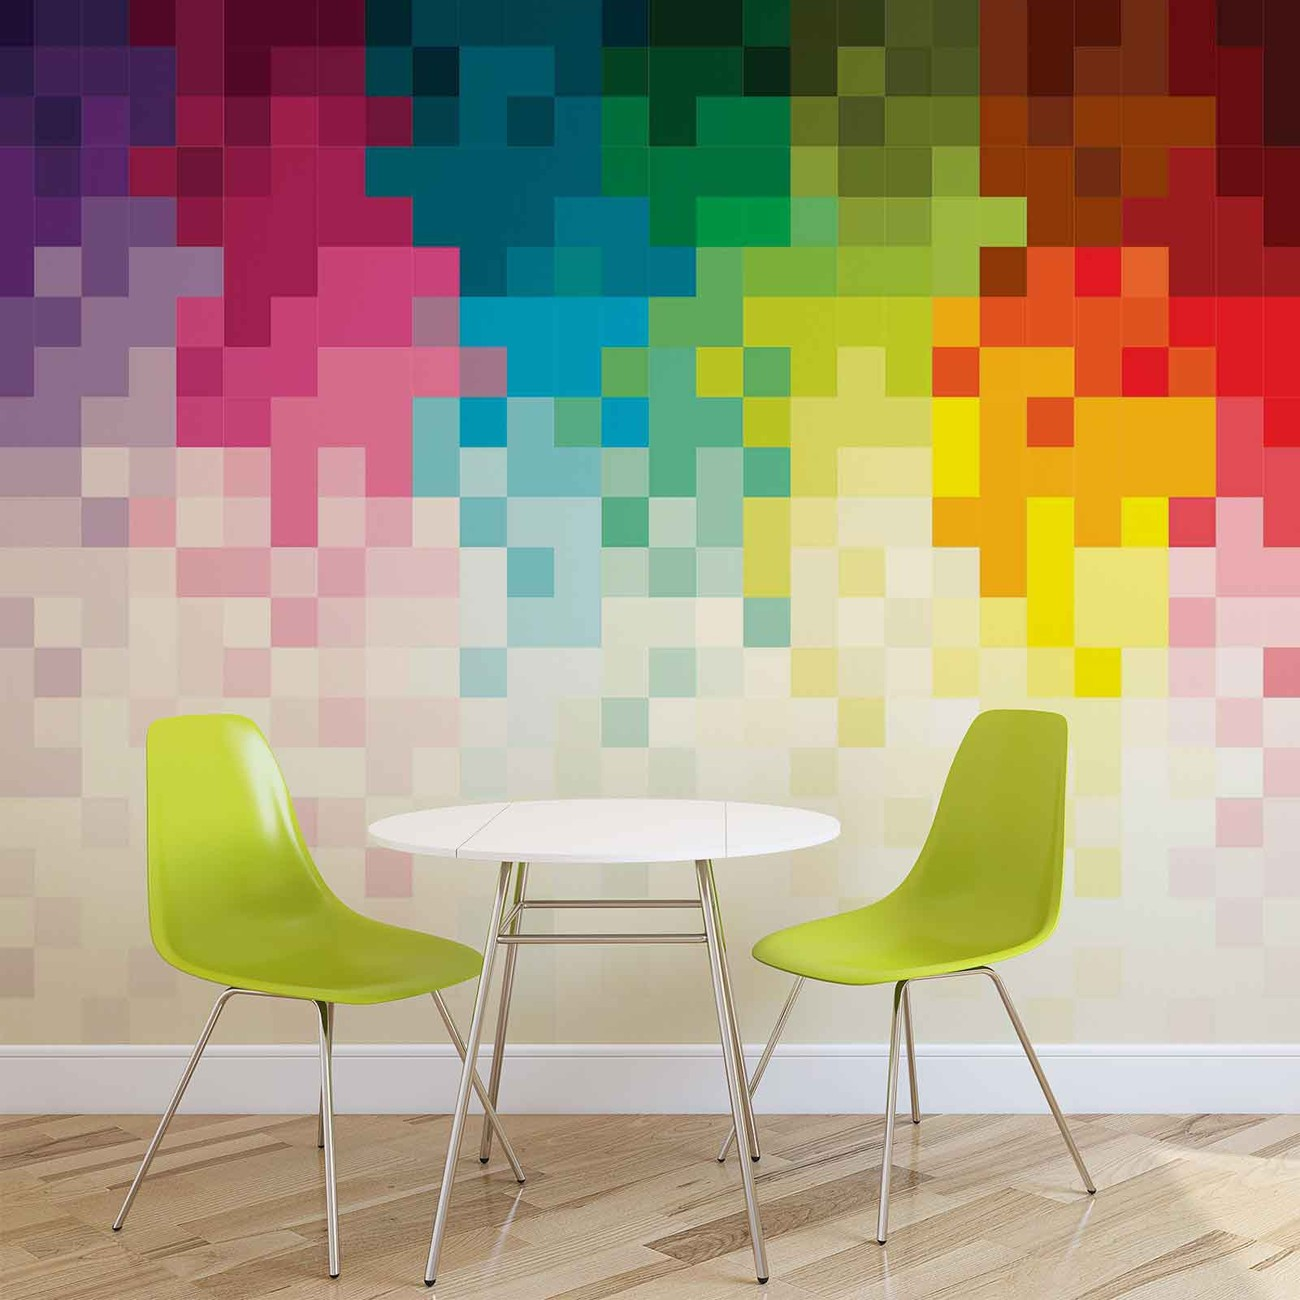 Fotomurale arcoiris patron pixel papel pintado - Fotomurales pixel ...